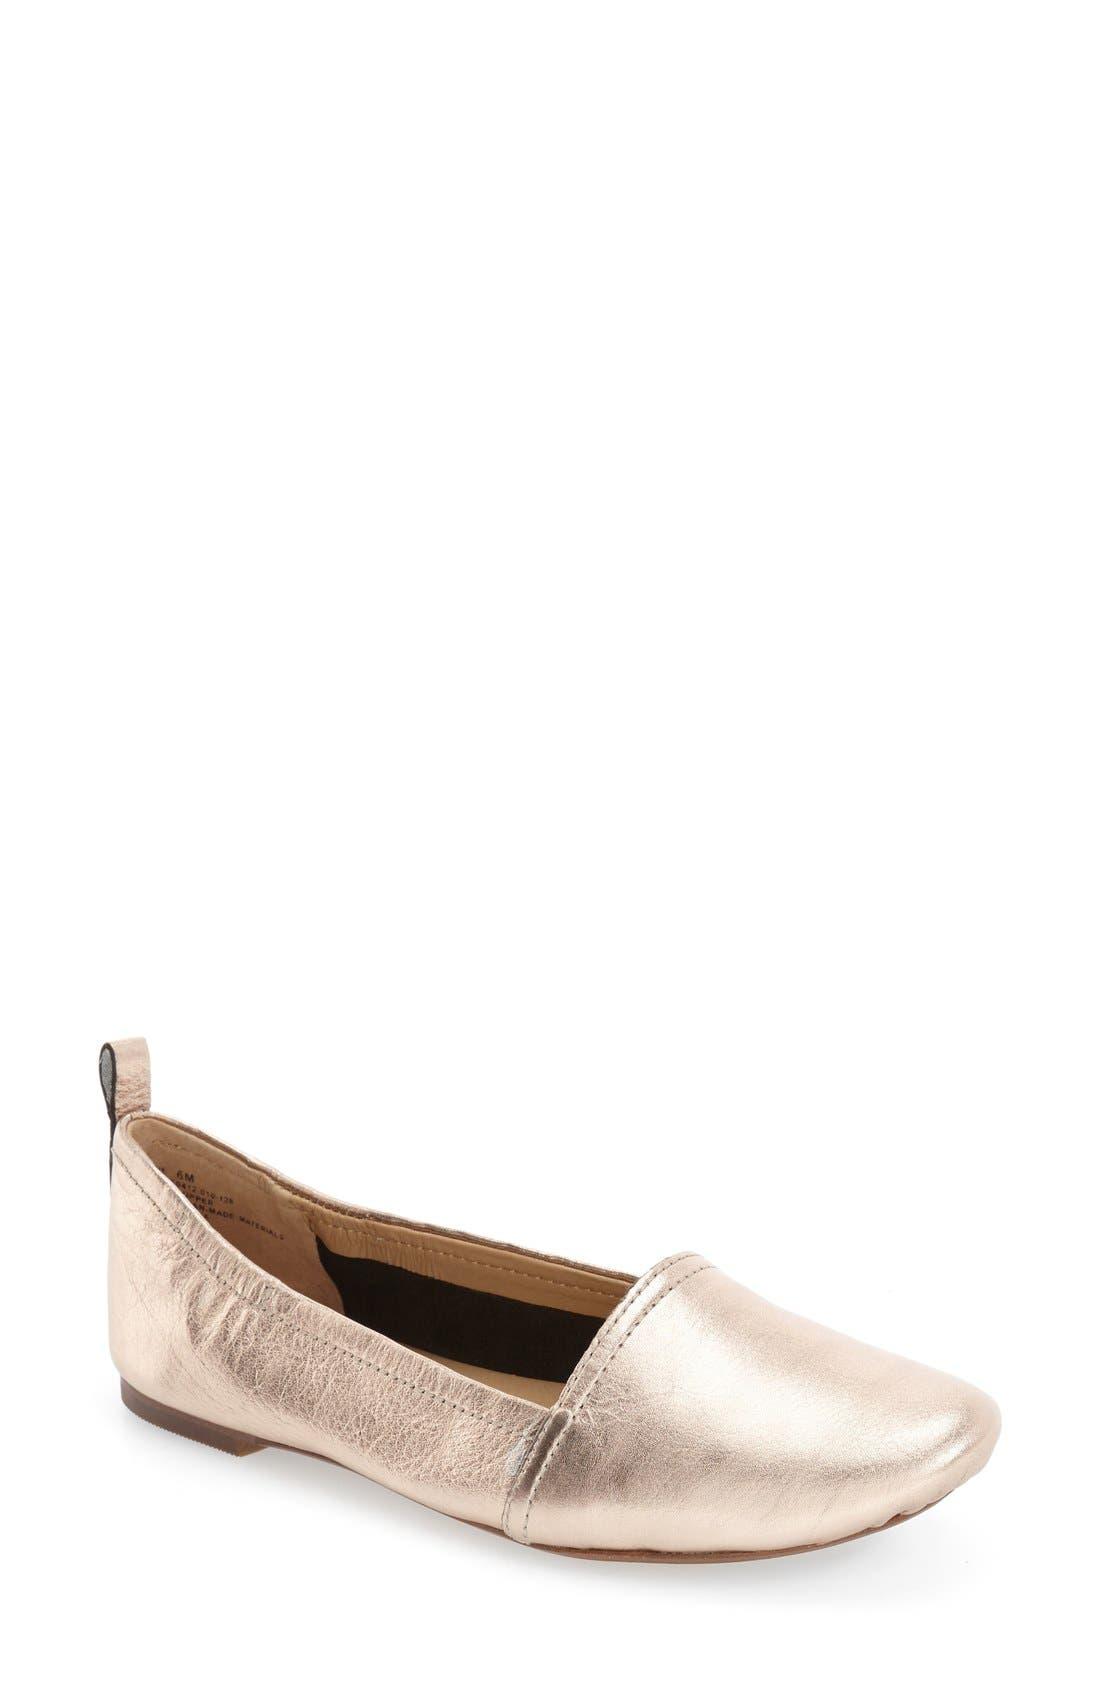 Latigo 'Bettie' Leather Flat (Women)